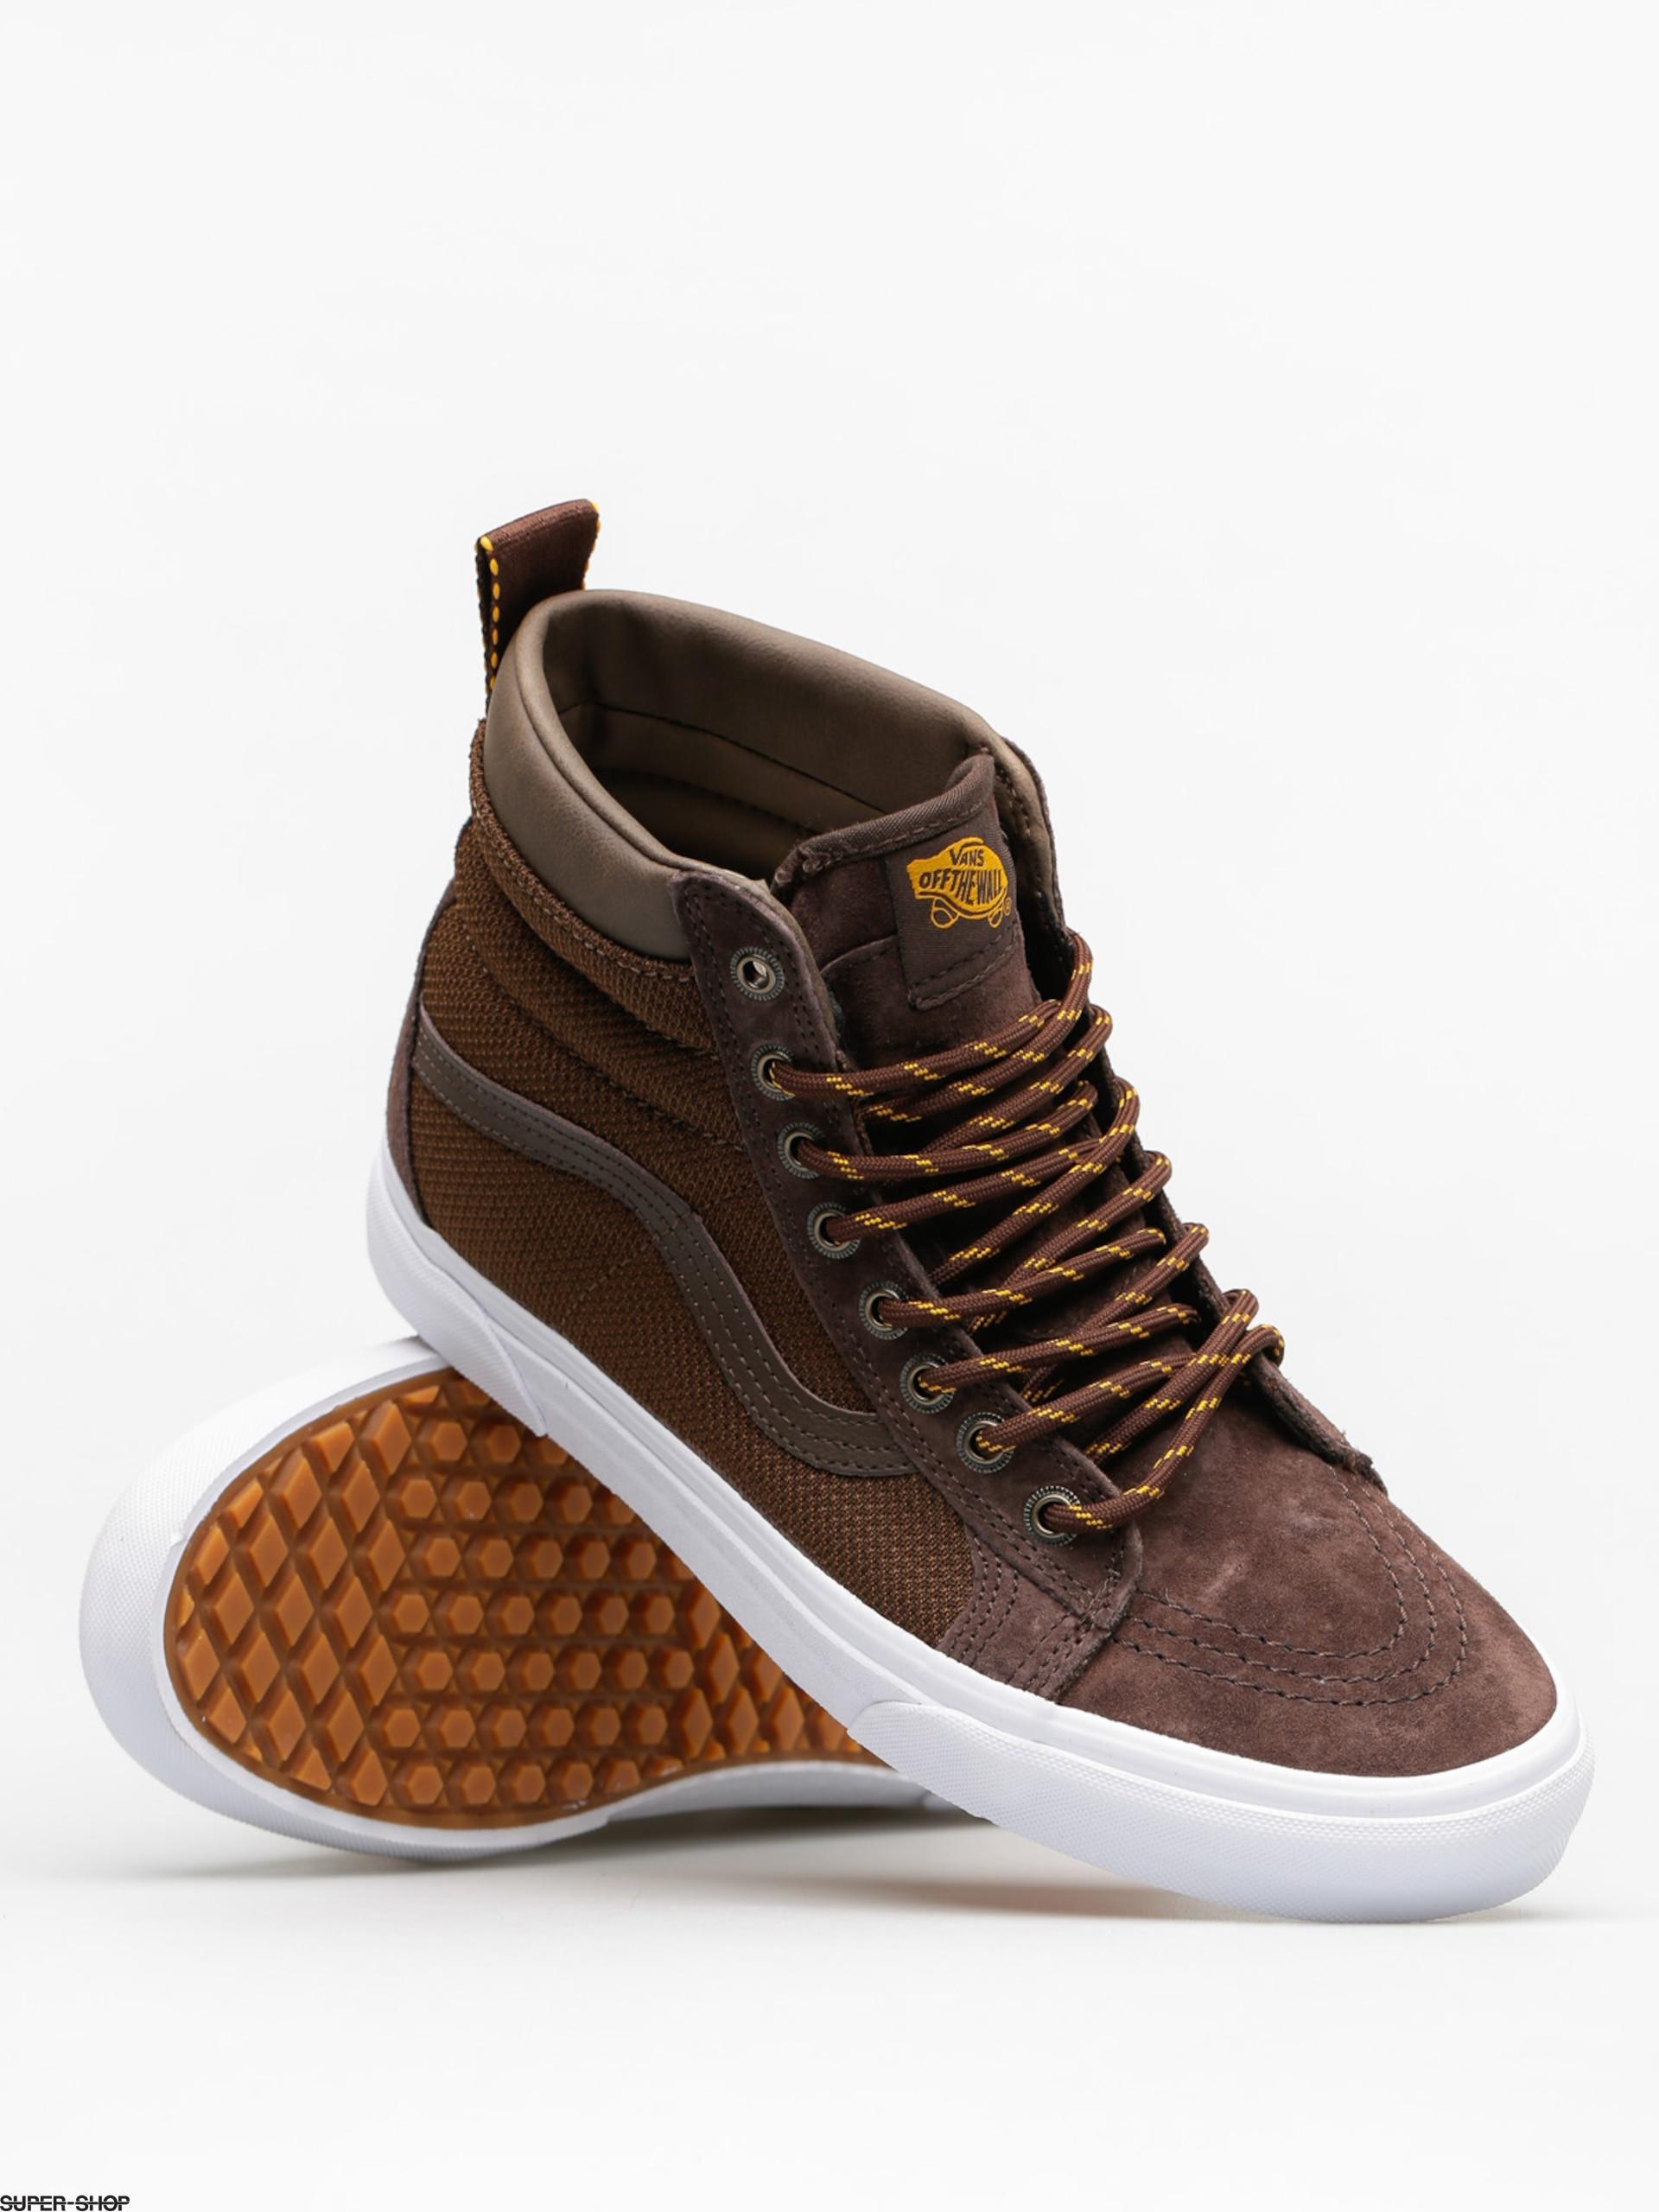 Shoes Similar To Vans Sk Hi